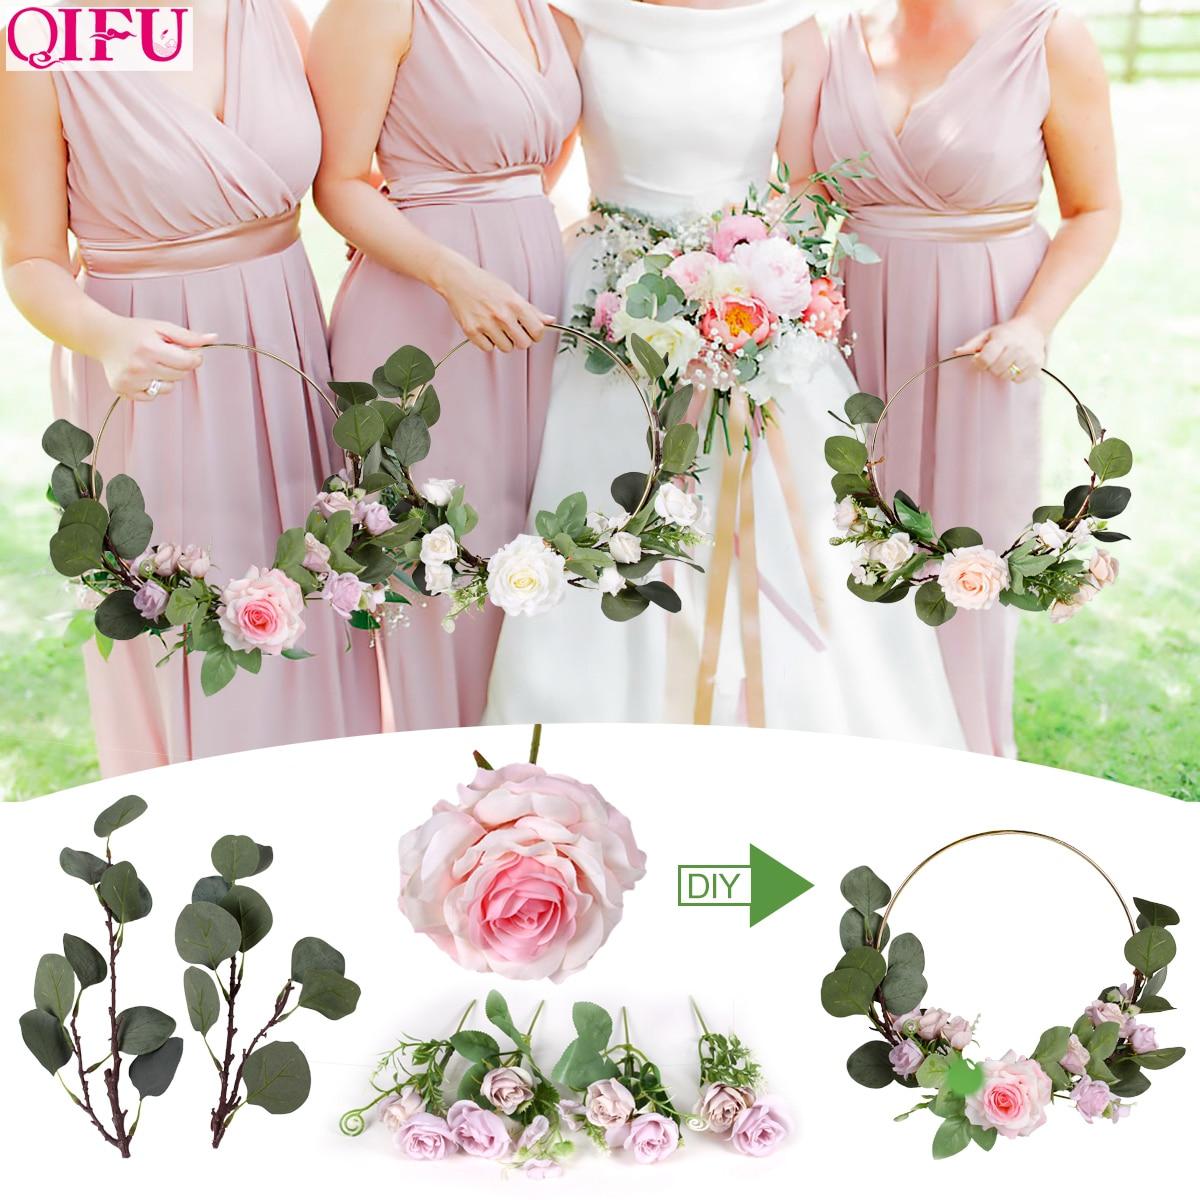 QIFU Metal Ring Wreath And Artificial Flower Wedding Door Hanging Decor Bridesmaid Handheld Garland Hawaiian Party Supplies